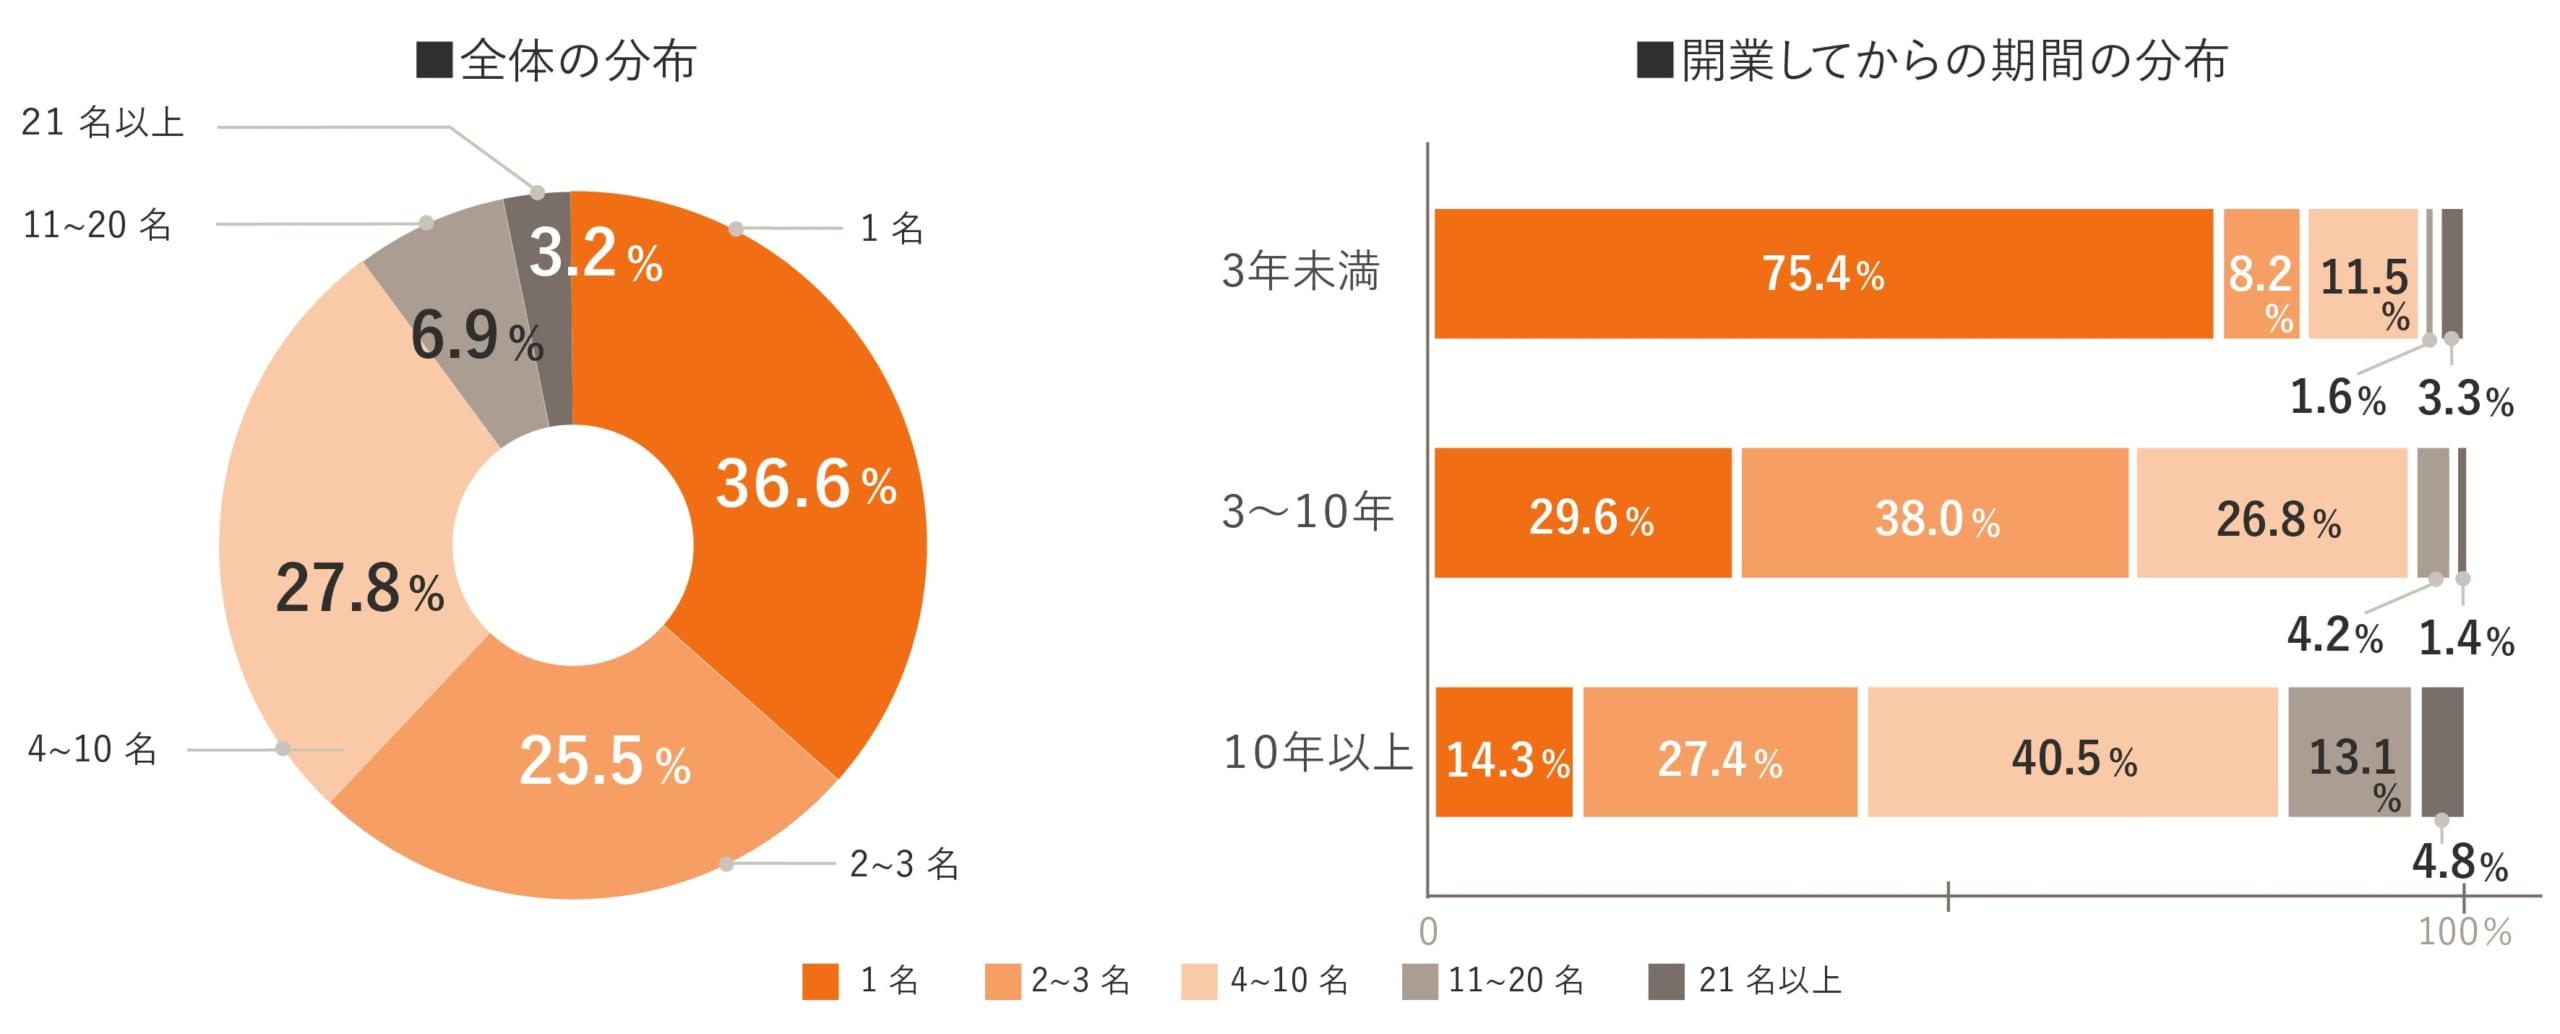 独立開業実態調査グラフ01